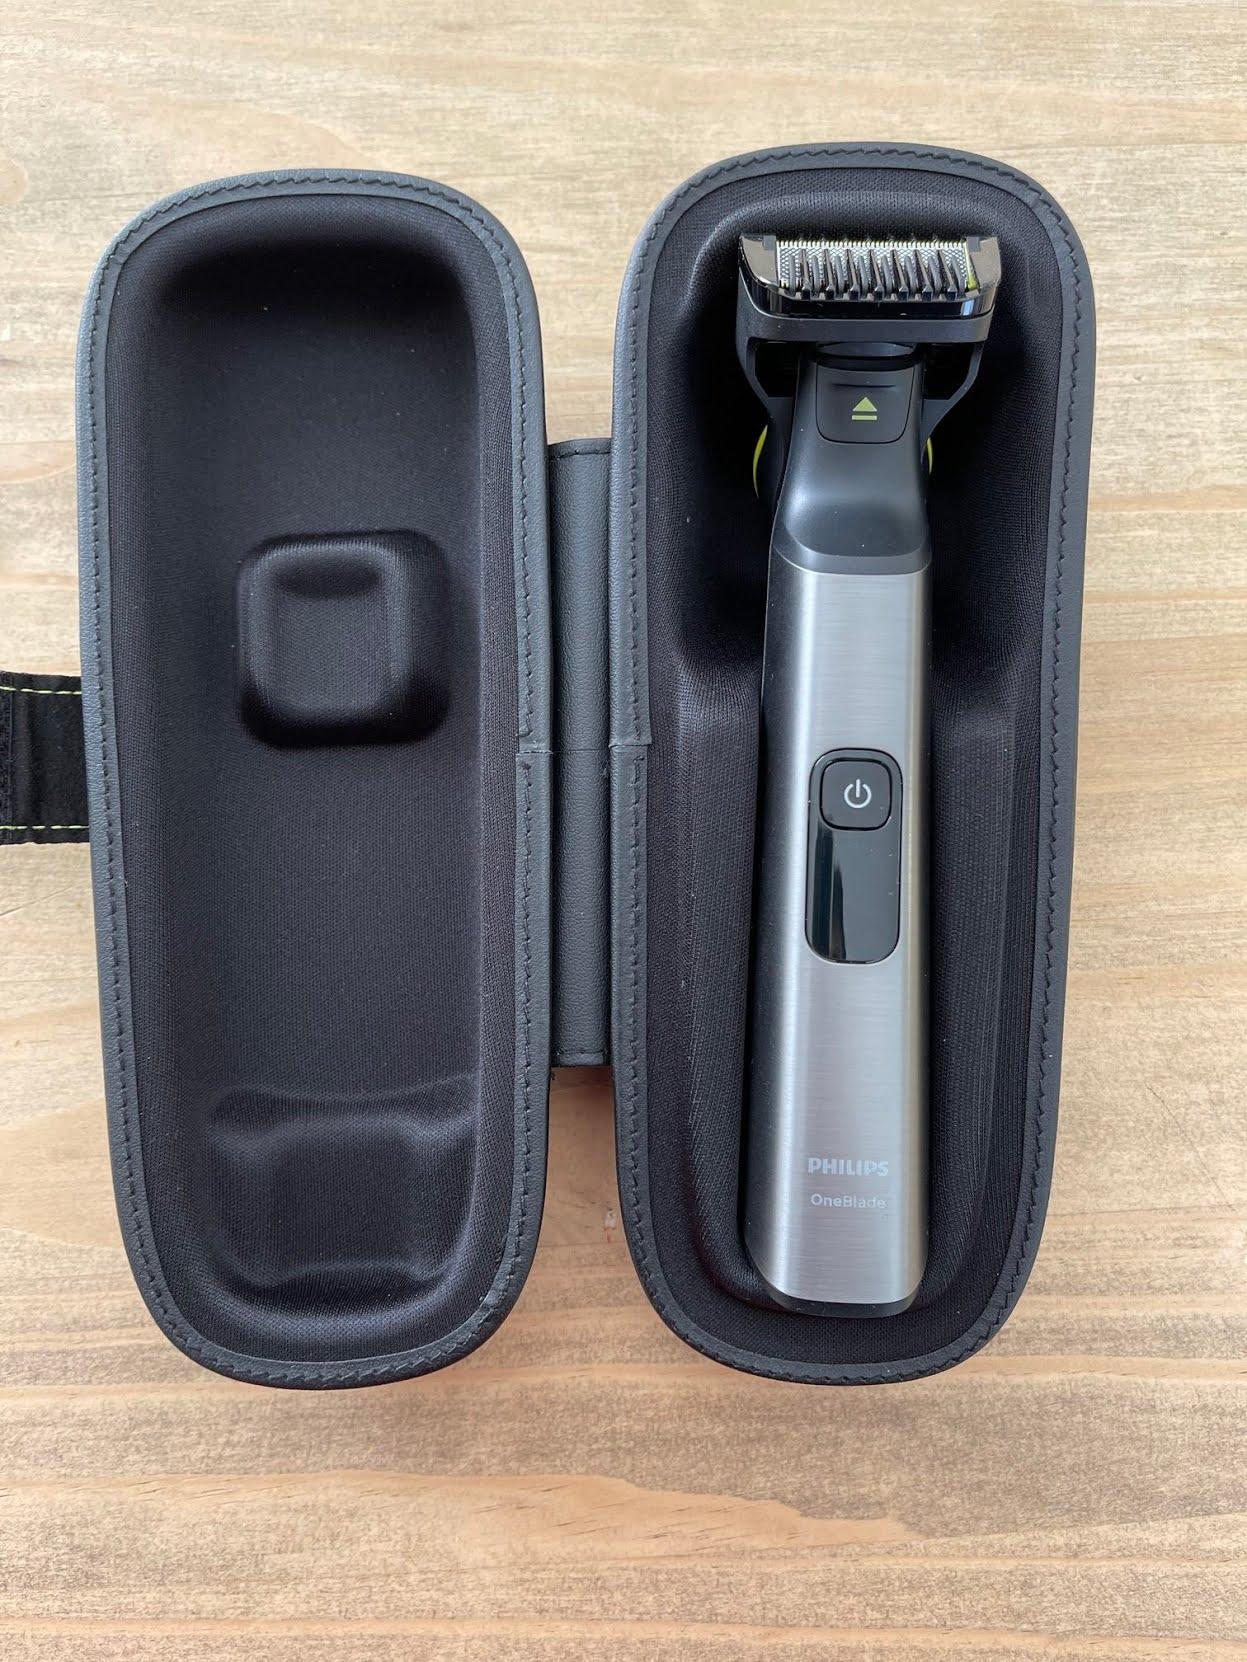 OneBlade Pro QP6550